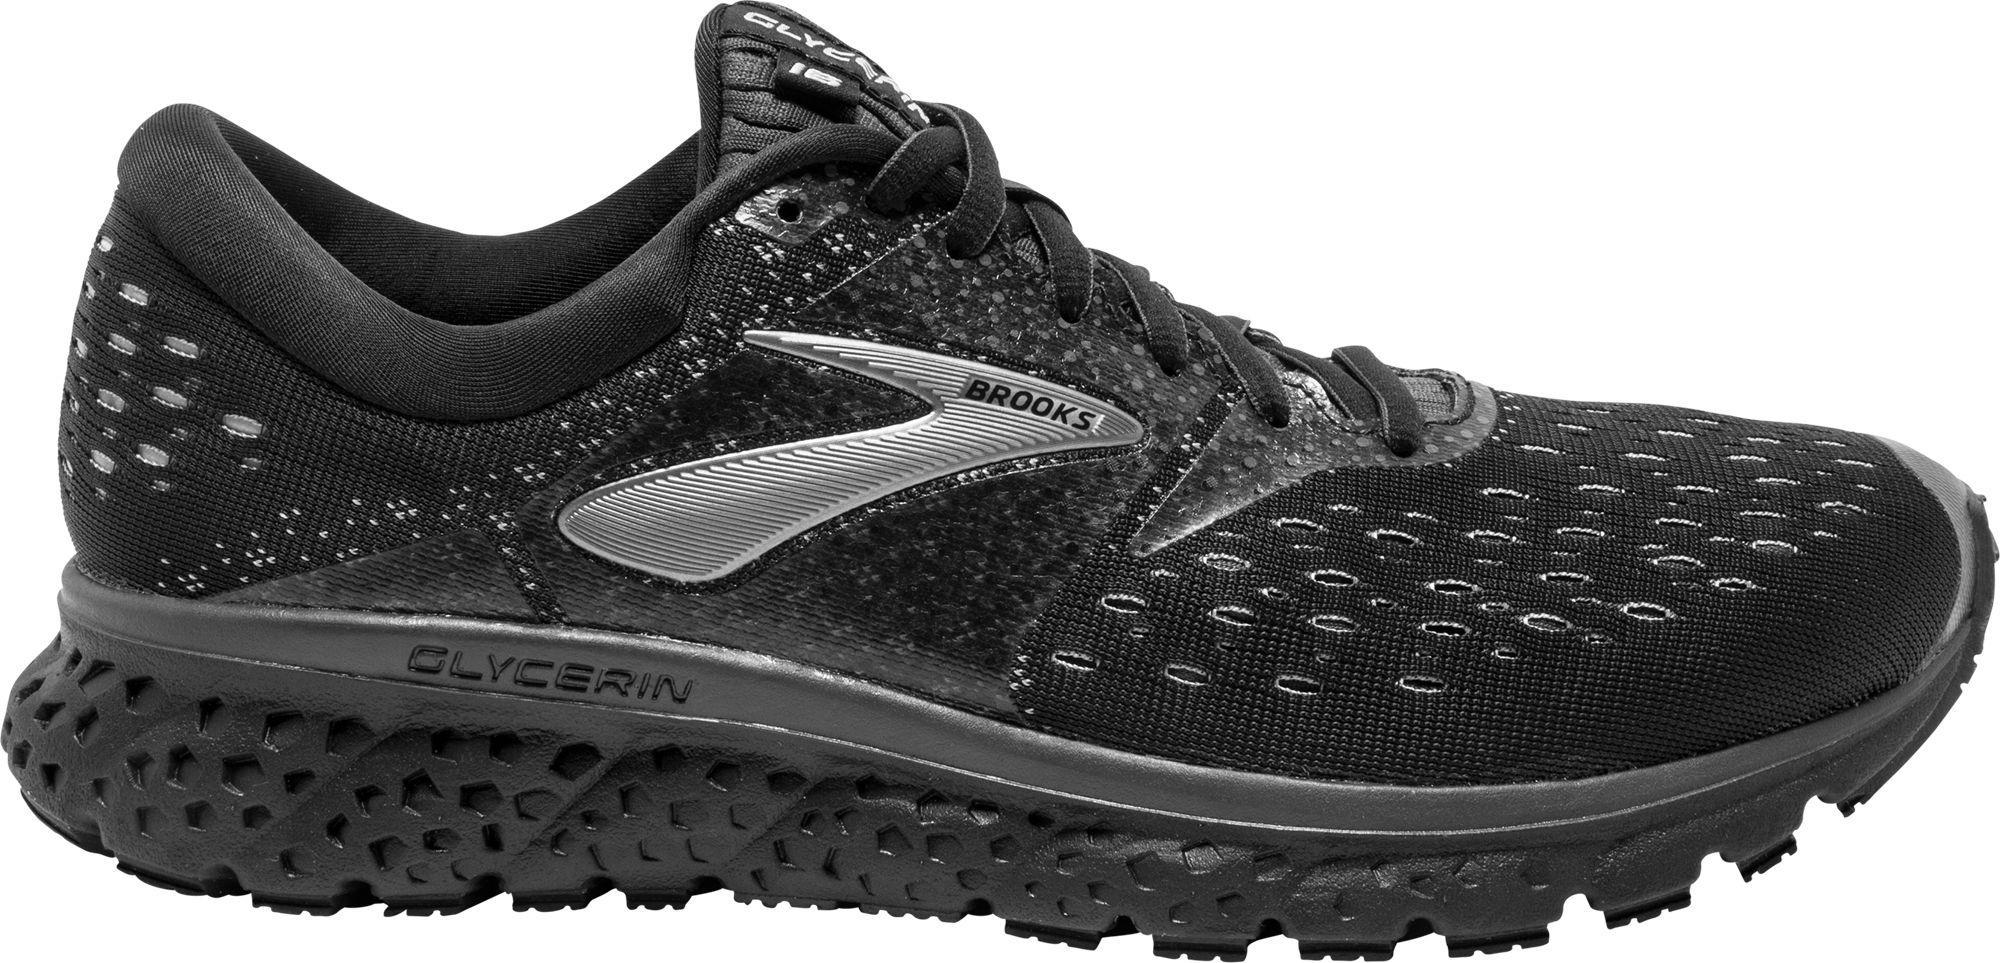 42d18f12523 Lyst - Brooks Glycerin 16 Running Shoes in Black for Men